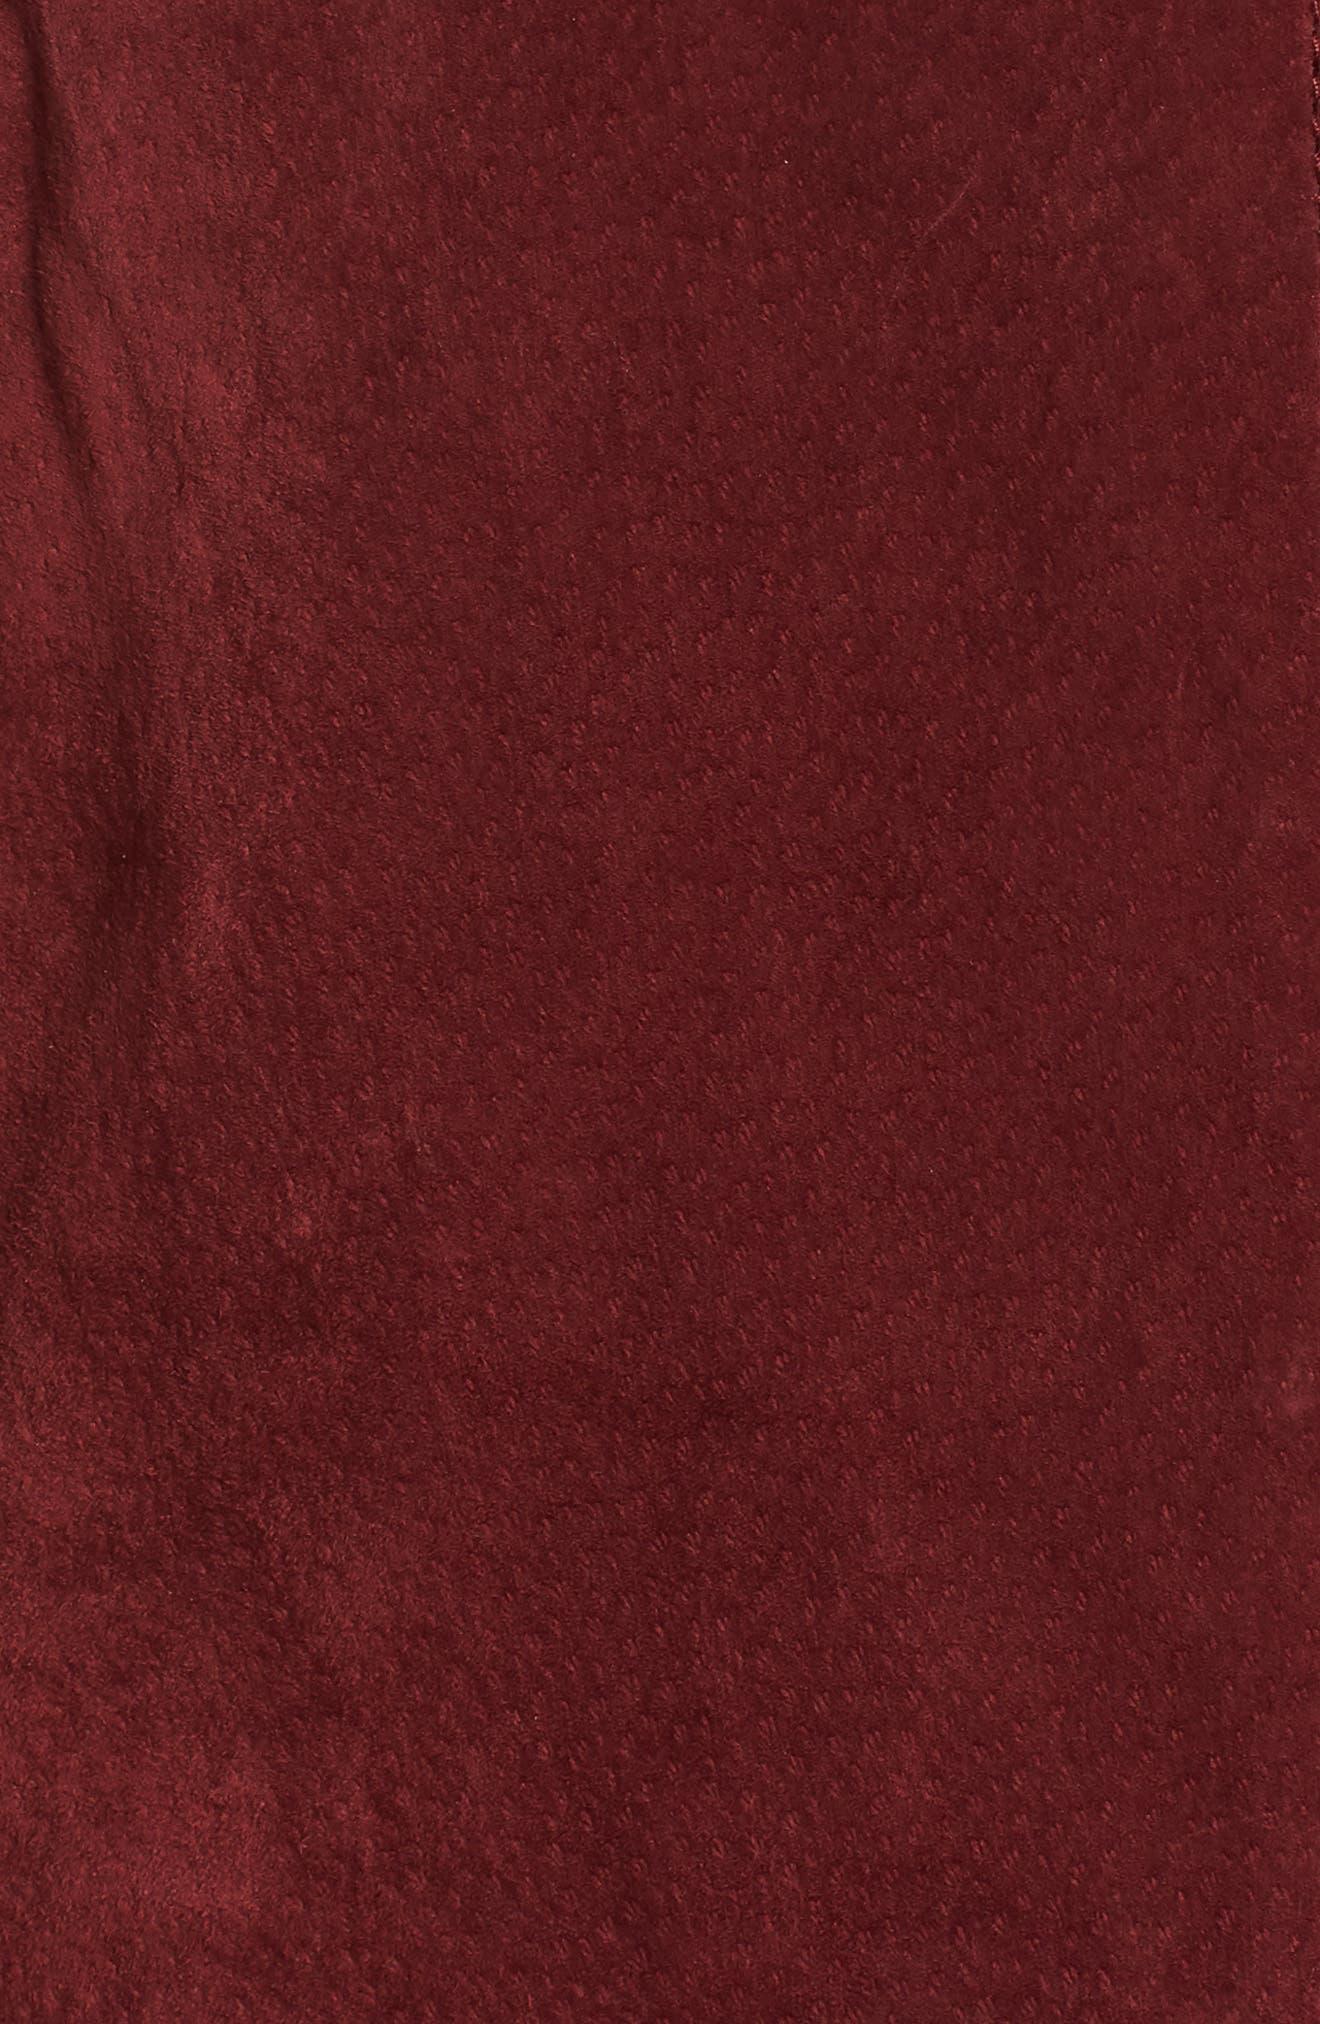 No Limit Suede Moto Jacket,                             Alternate thumbnail 6, color,                             Ruby